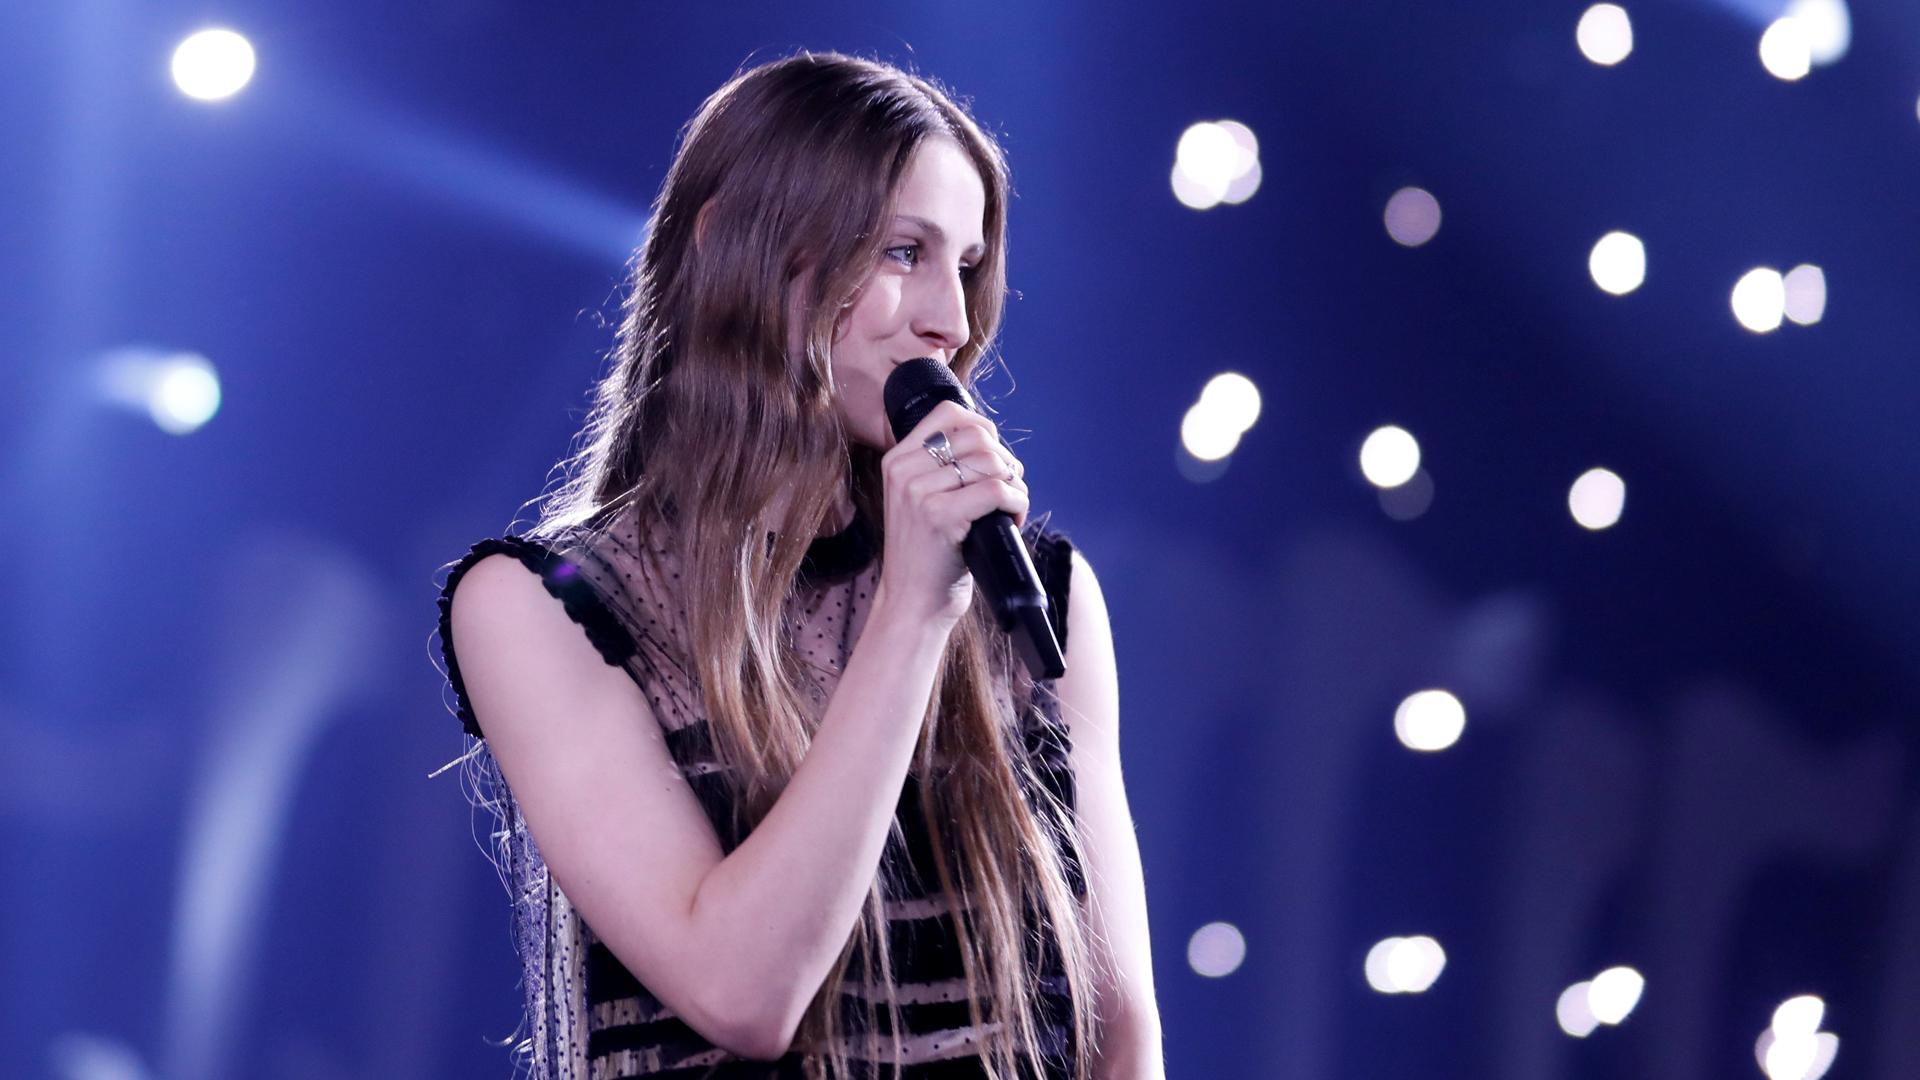 belgica eurovision